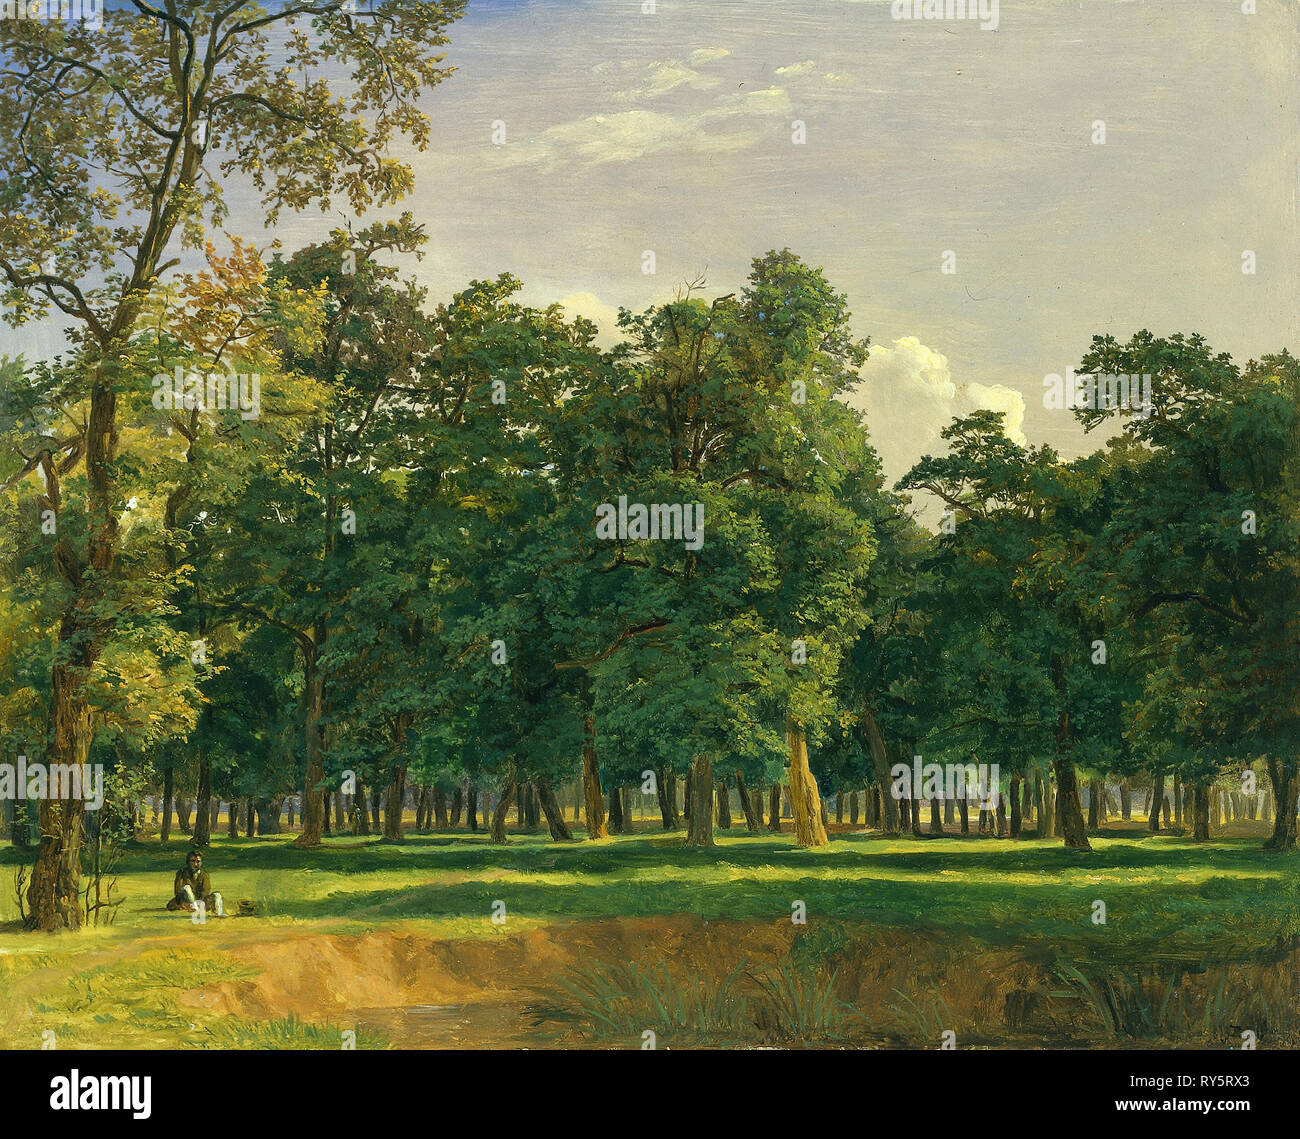 Prater Landscape, c. 1831. Ferdinand Georg Waldmüller (Austrian, 1793-1865). Oil on wood panel; framed: 37.5 x 43.5 x 5.5 cm (14 3/4 x 17 1/8 x 2 3/16 in.); unframed: 25 x 31 cm (9 13/16 x 12 3/16 in - Stock Image